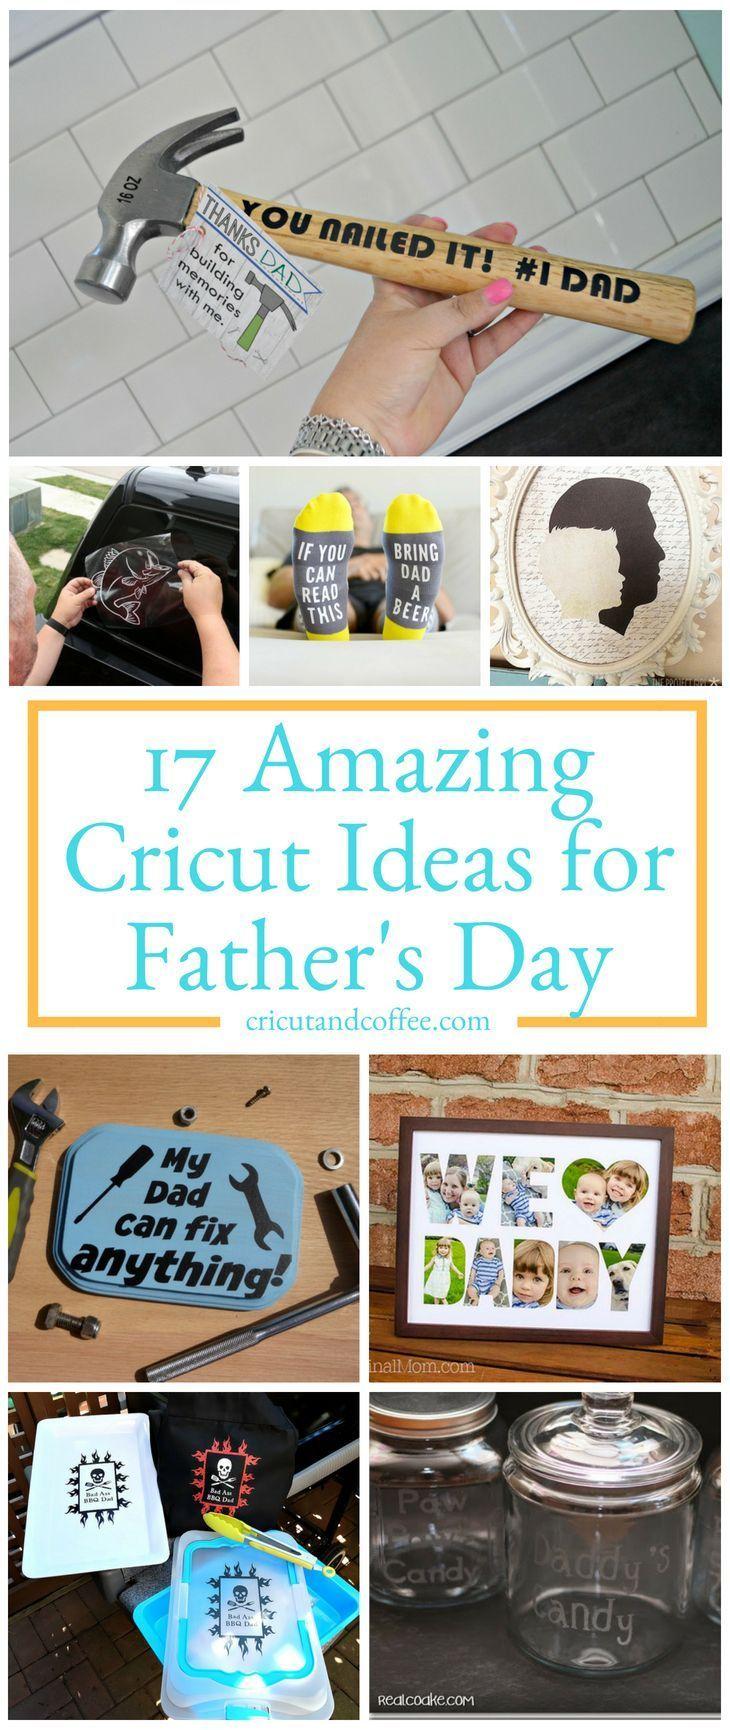 cricut gift ideas for dad